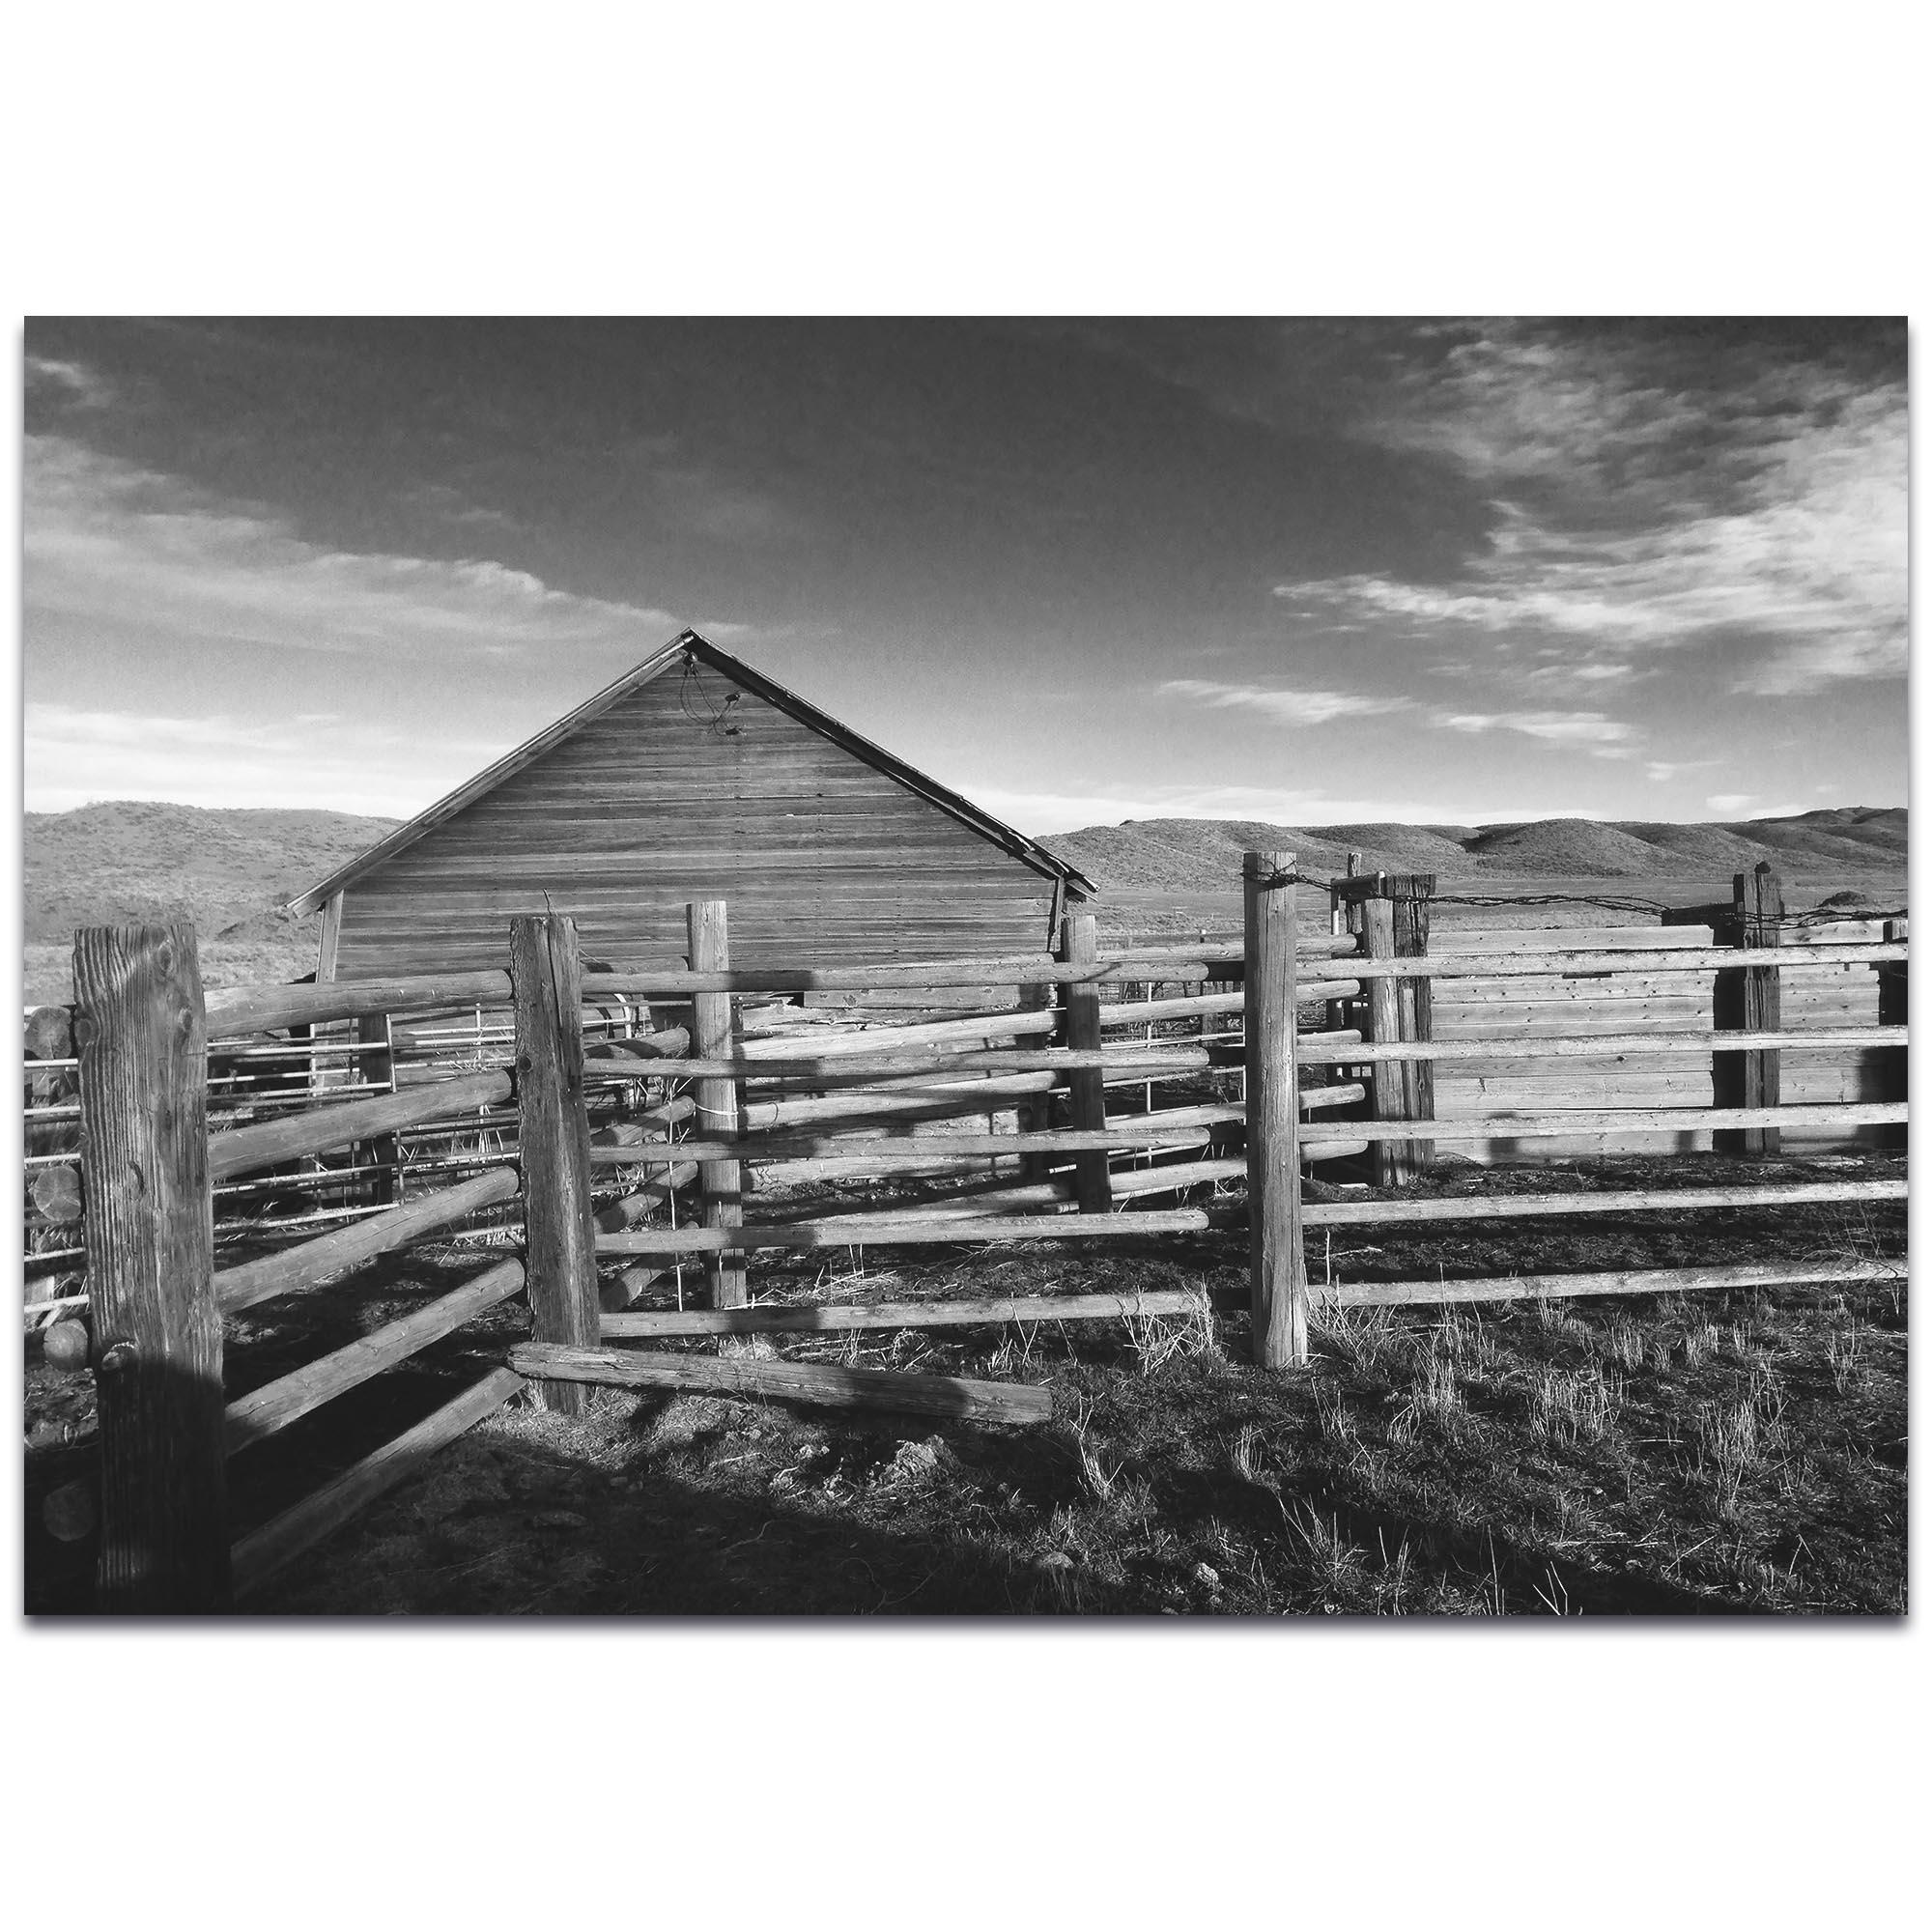 Weston Wy Steel Buildings Reviews 2: Old West Farm By Slade Reiter